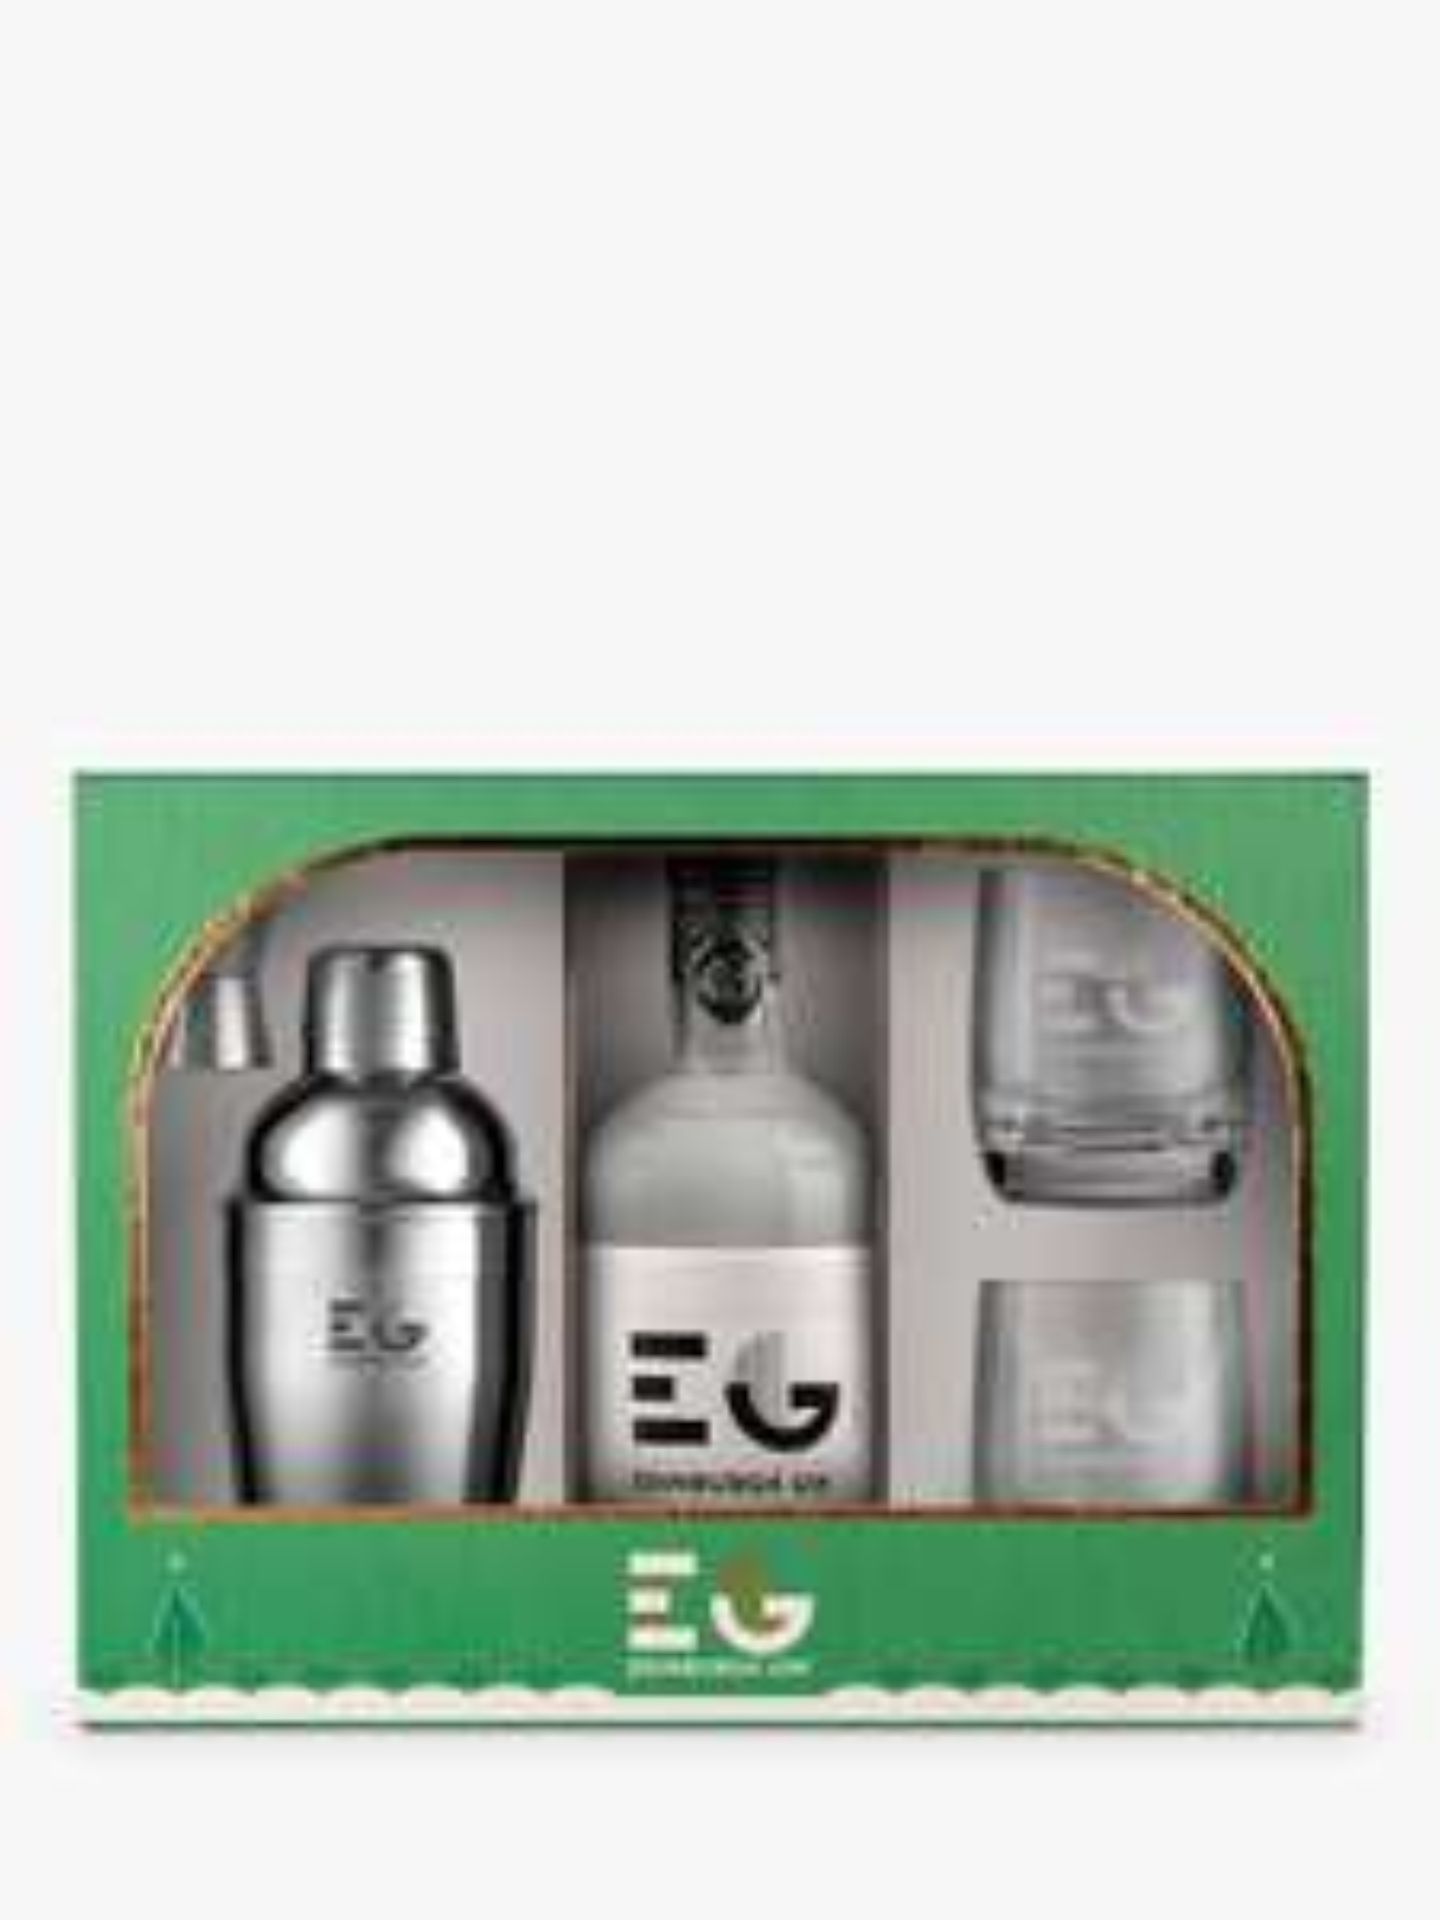 Edinburgh Gin Cocktail Shaker and Glasses Gift Set £64 down to £48 @ John Lewis & Partners